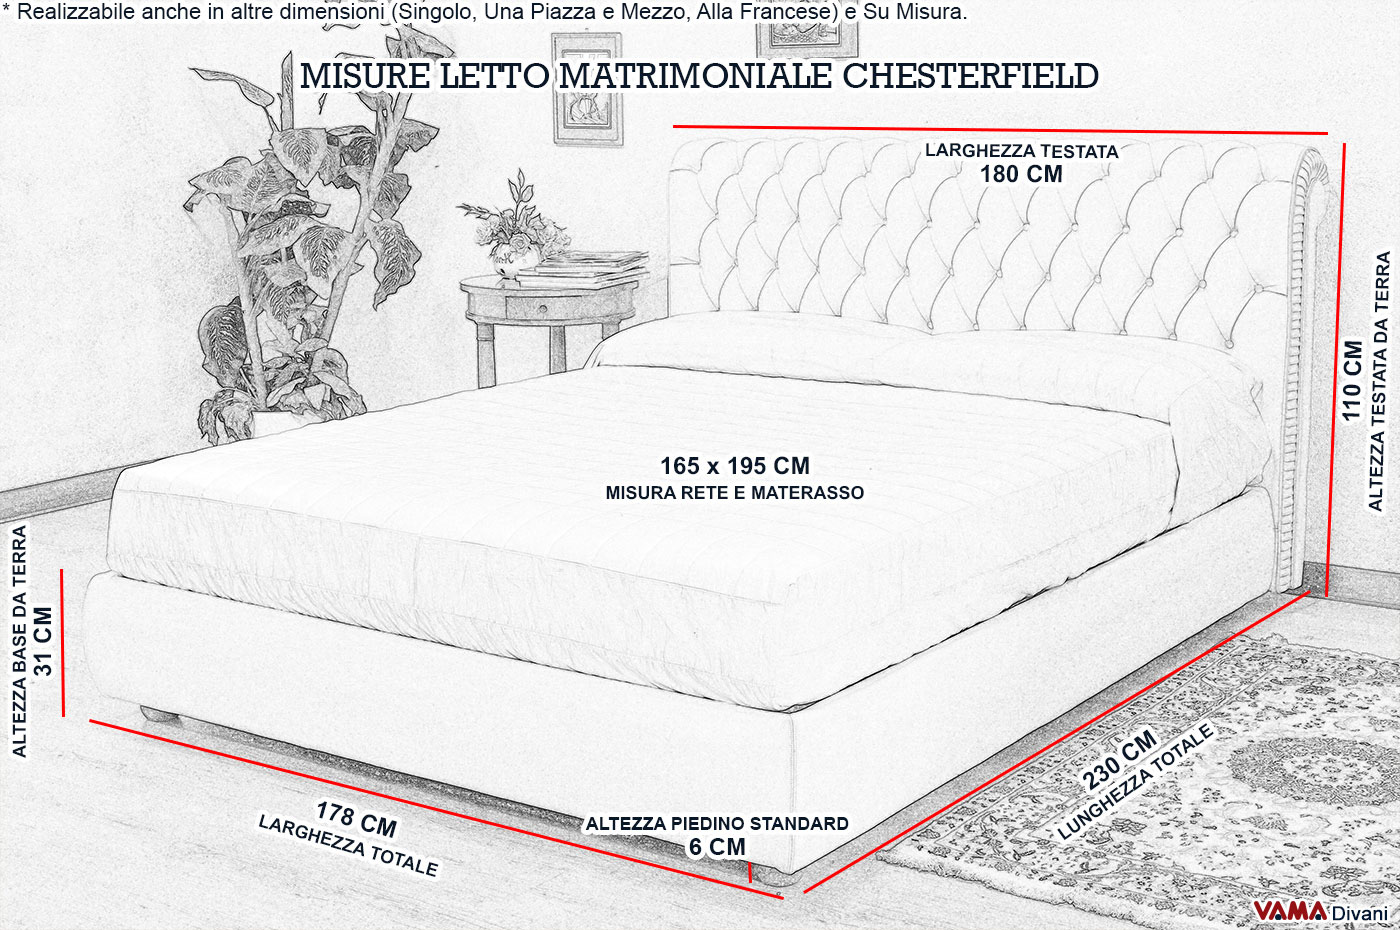 Letto chesterfield matrimoniale in pelle realizzabile su misura - Divano letto matrimoniale misure ...